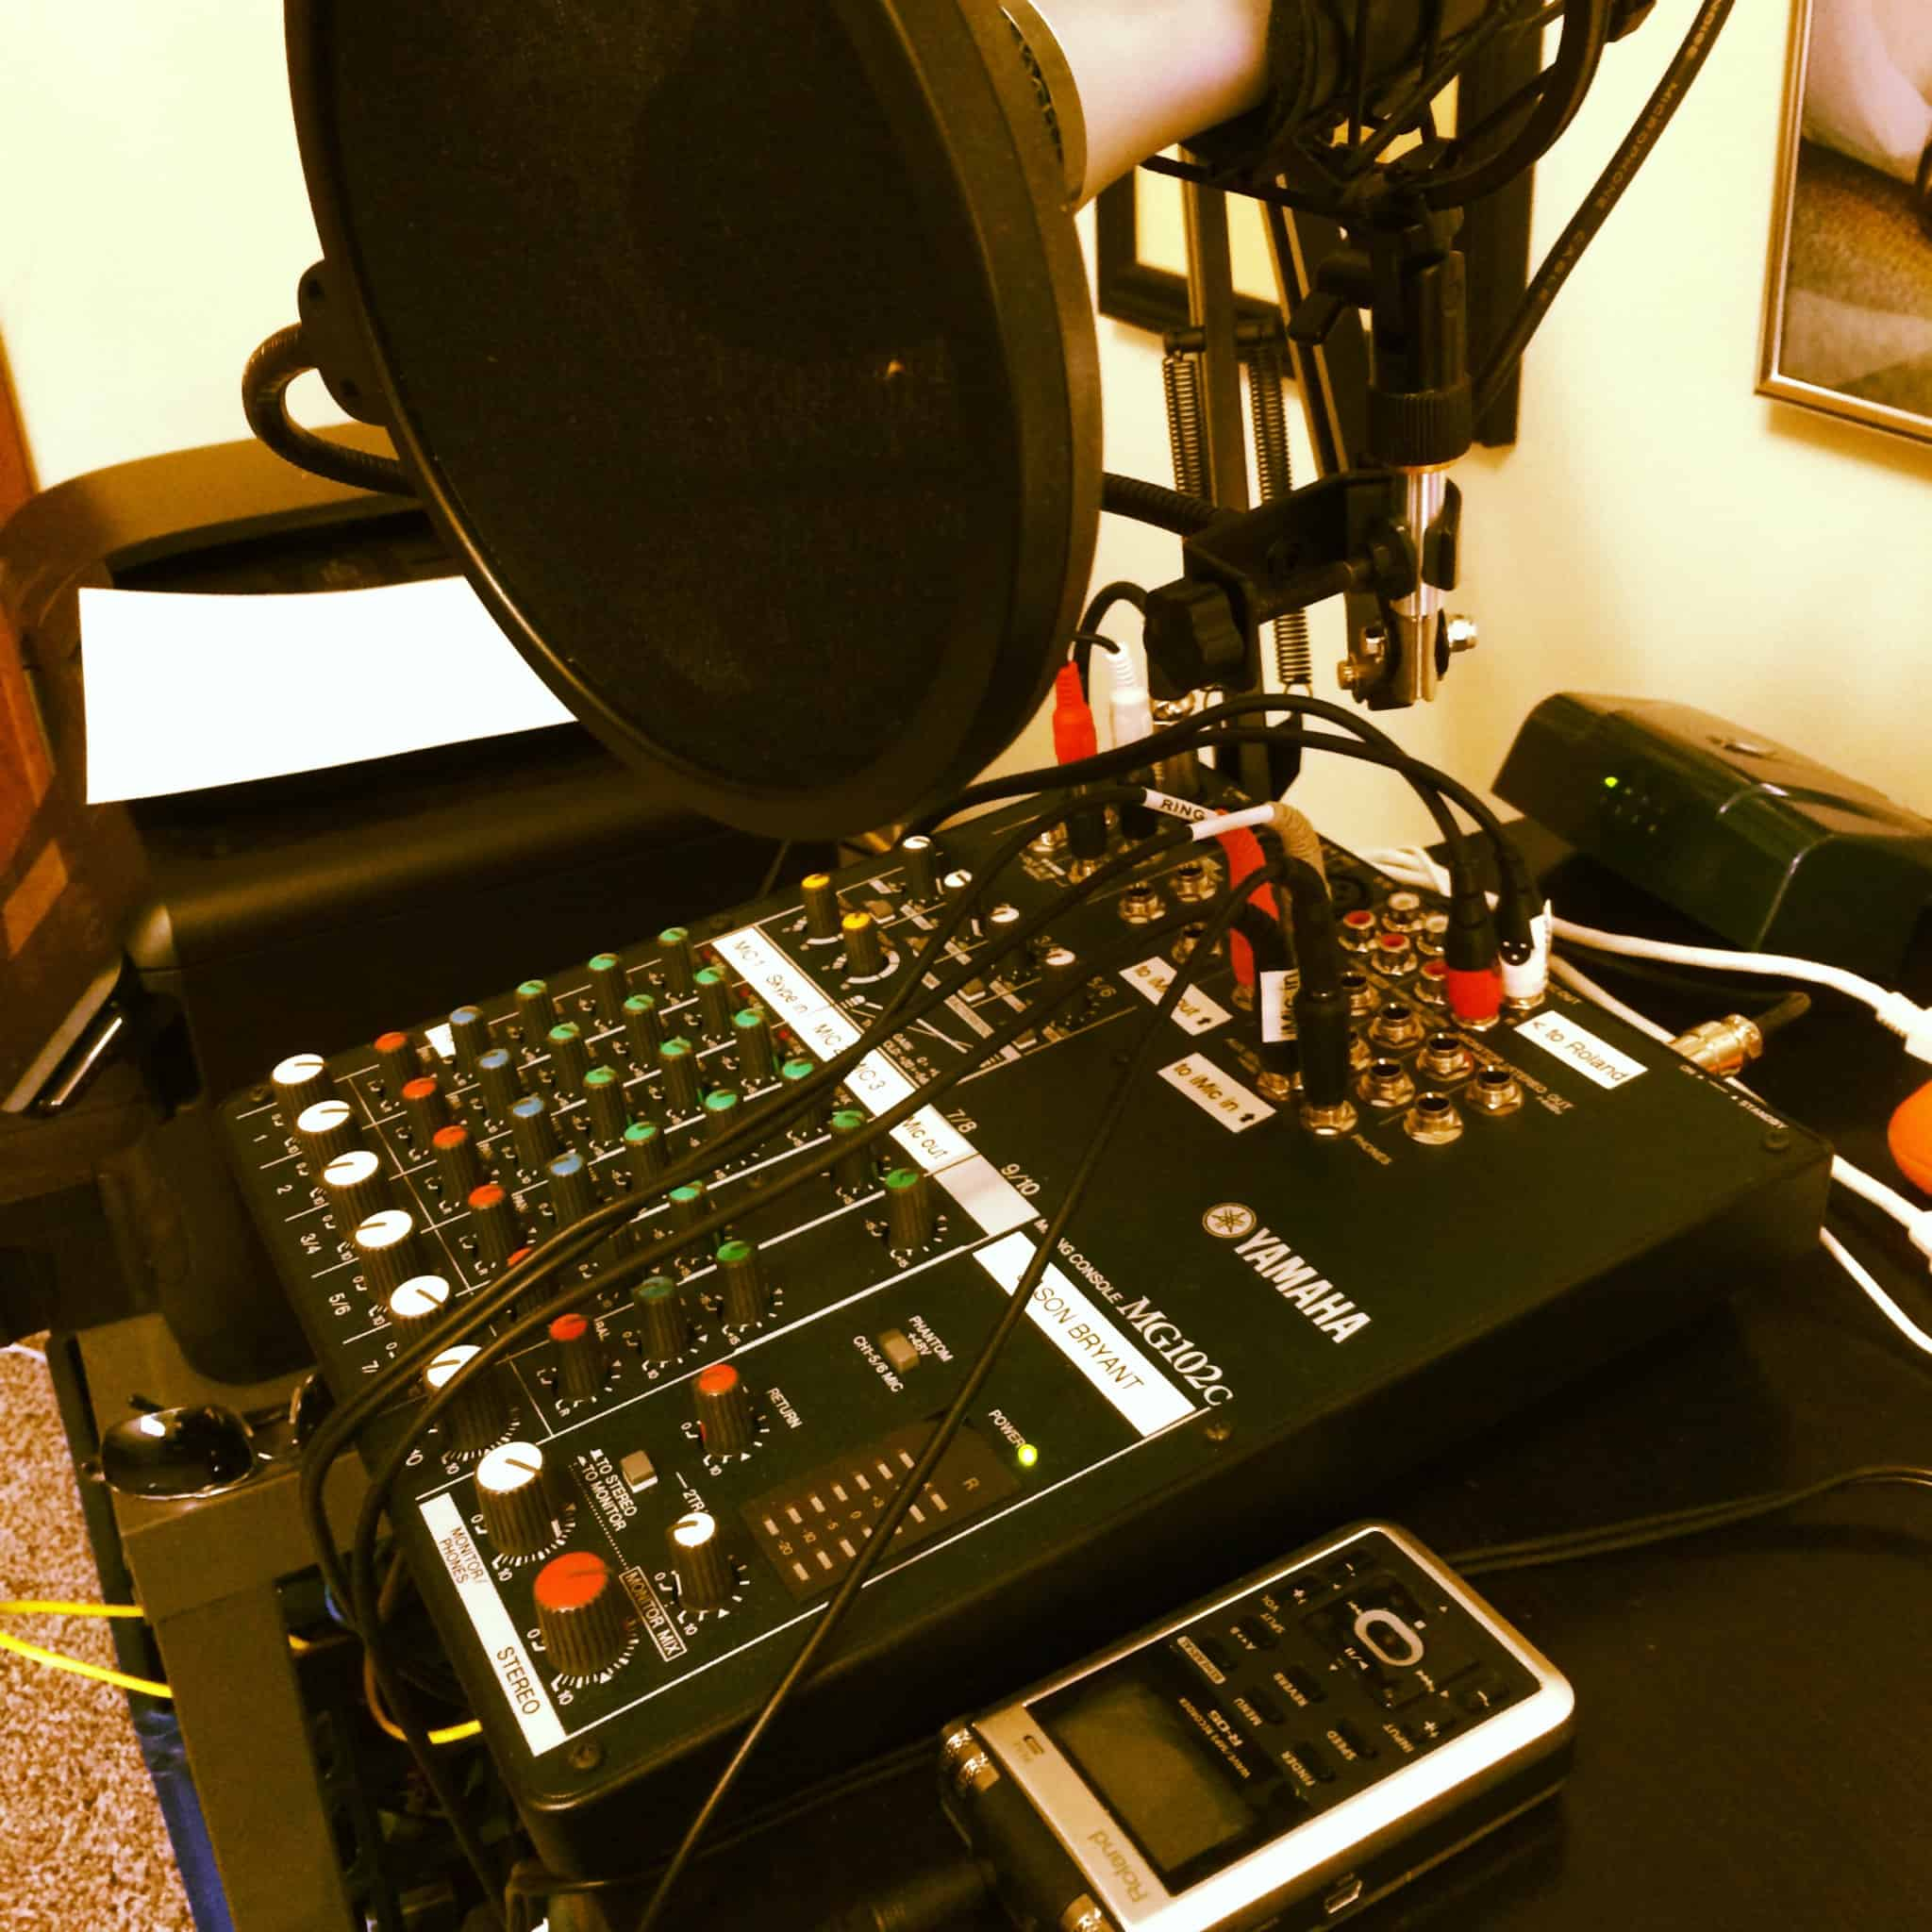 Blog: Smartphones usher in golden age for podcasting – Chicago Tribune